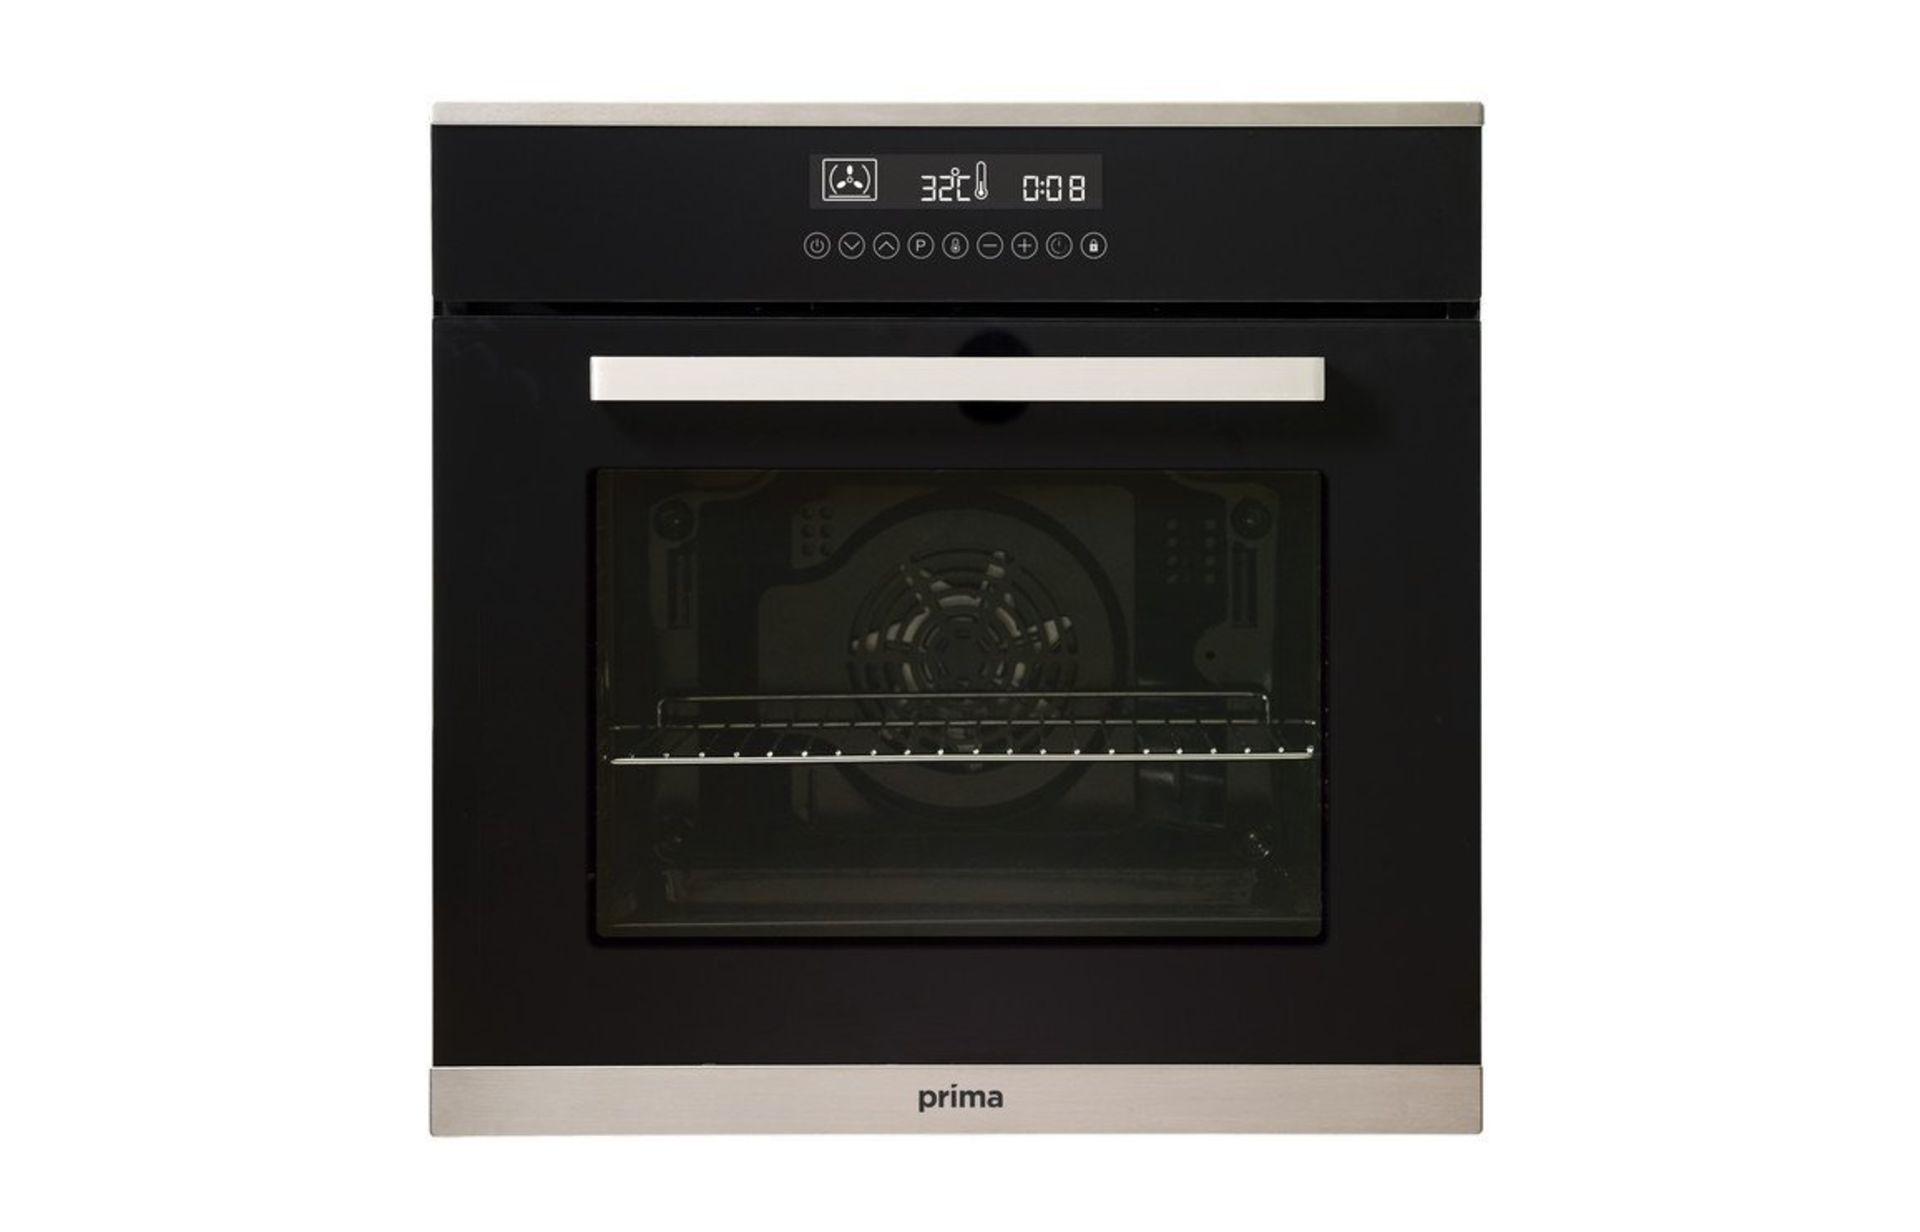 Lot 671 - (KA17) Prima+ PRSO108 B/I Single Electric Fan Oven - Black & St/Steel RRP £287.68. A Built I...